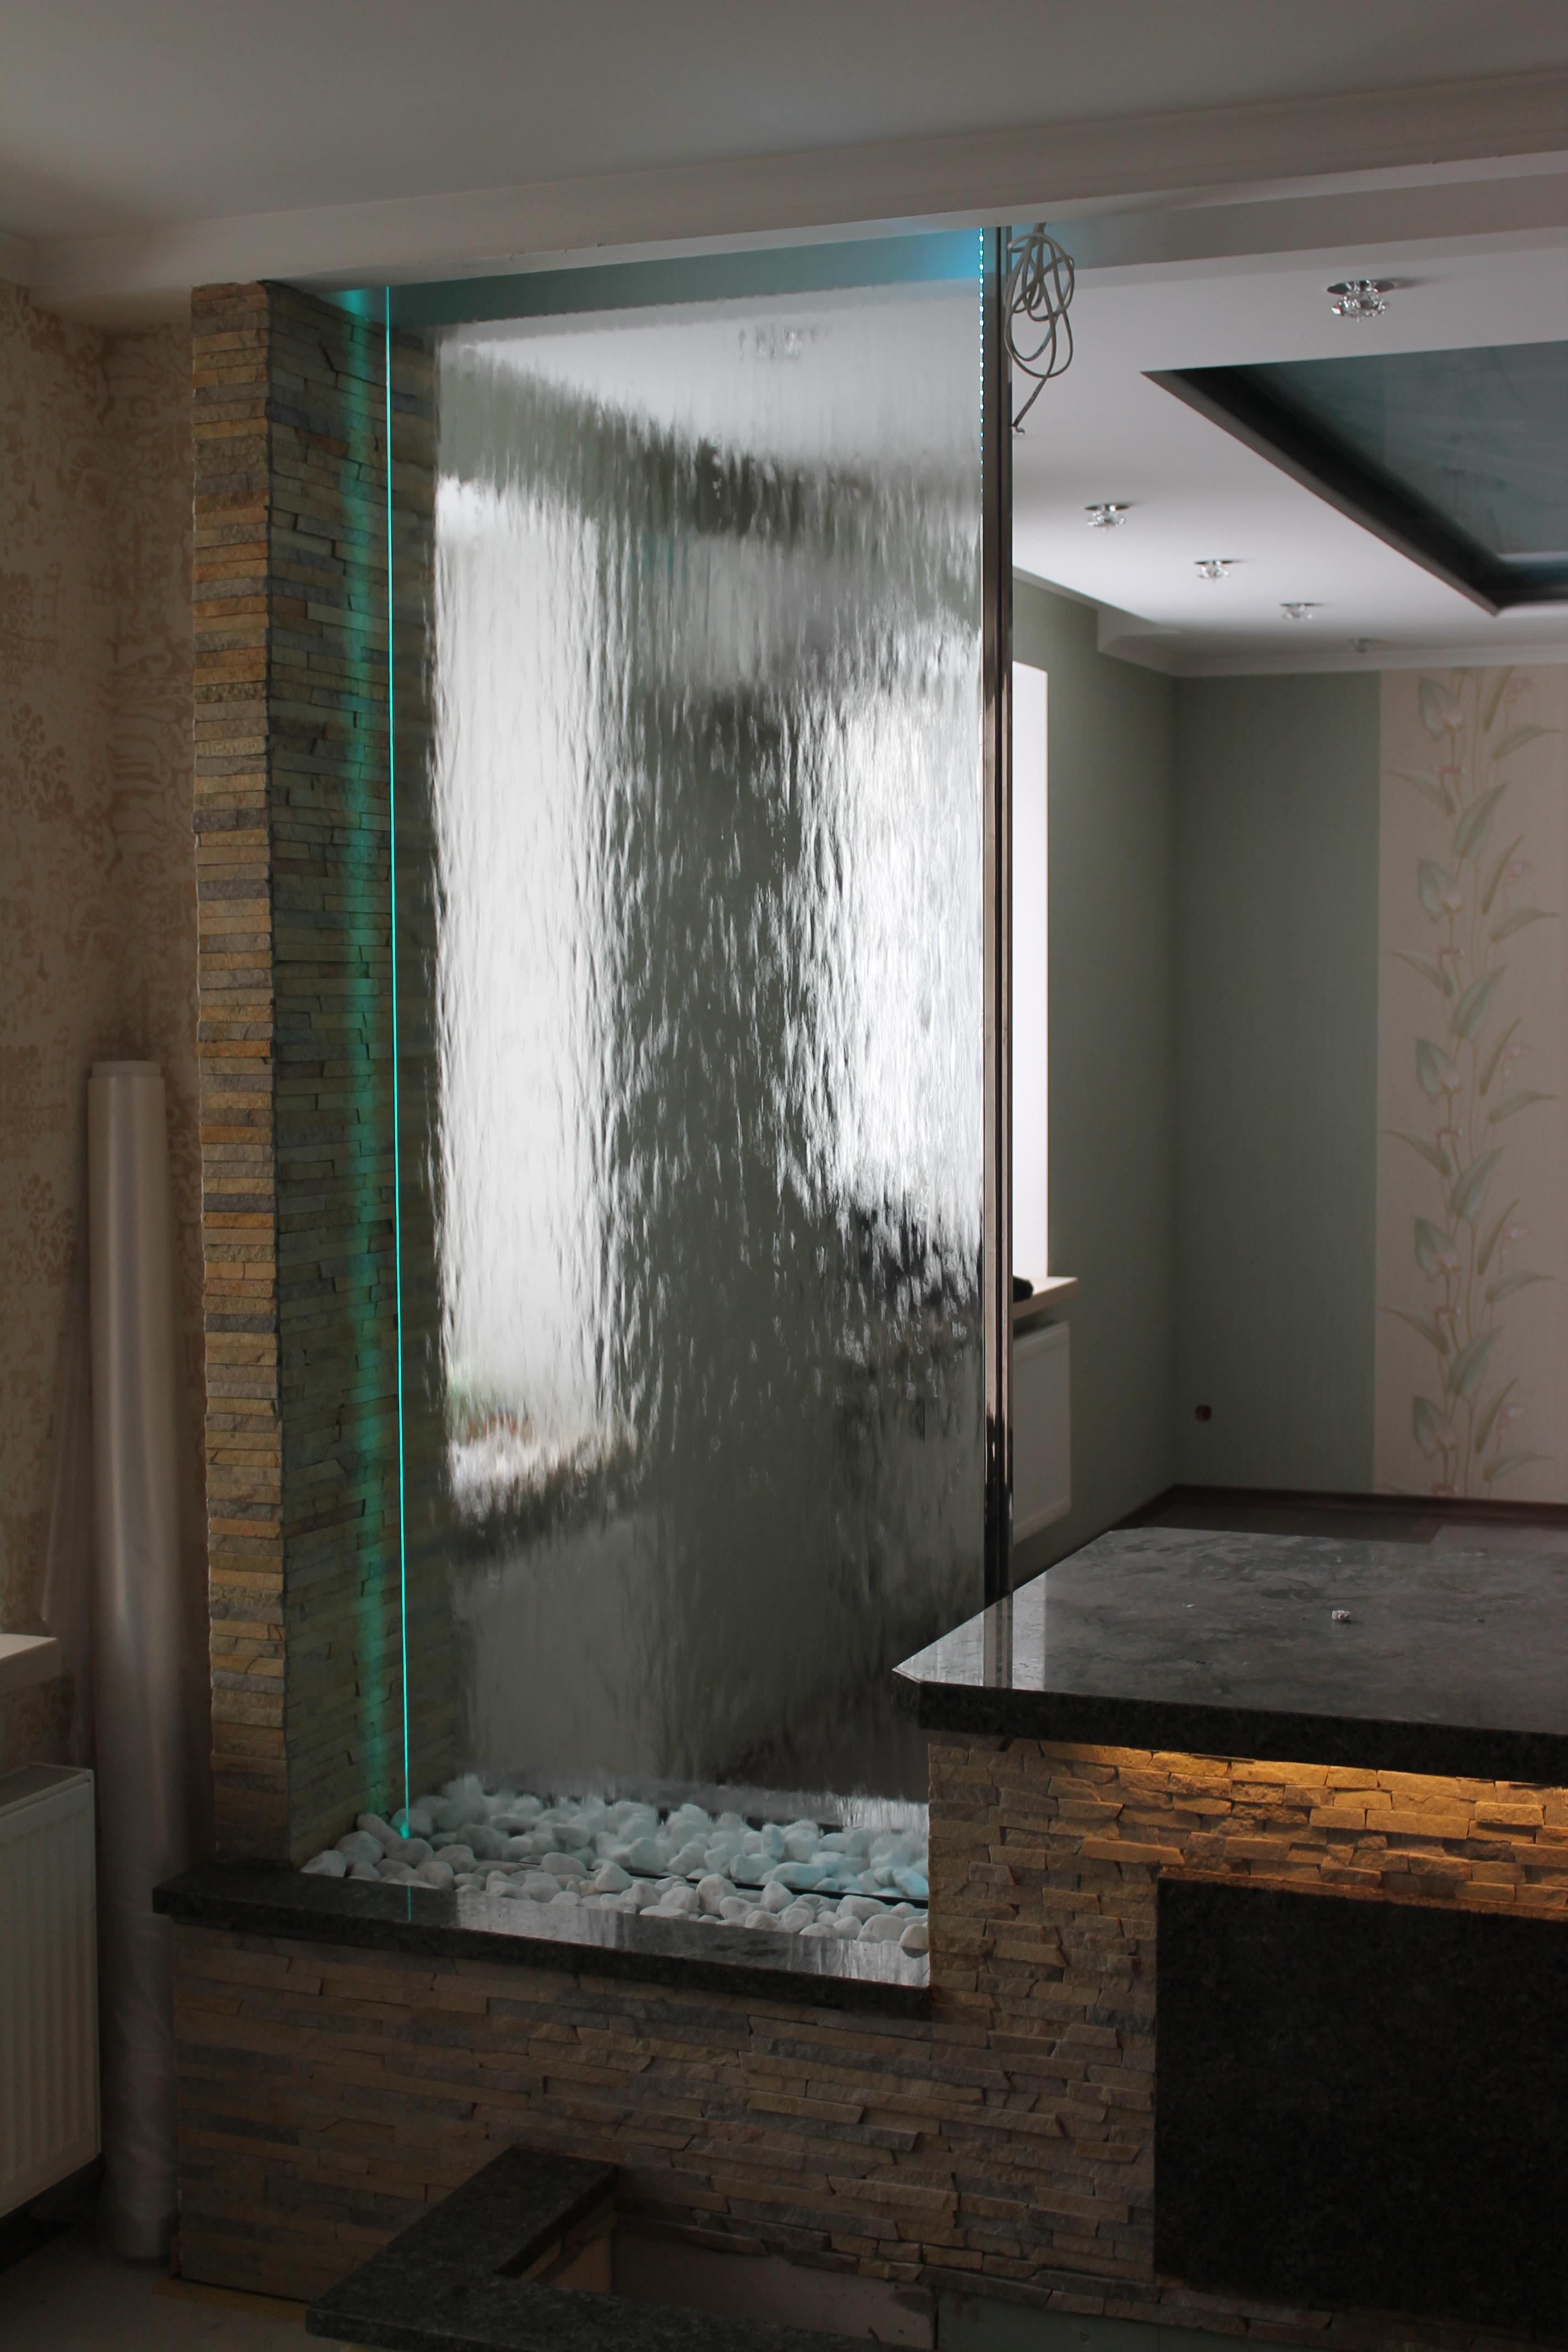 dekorativnij-vodopad-48542b